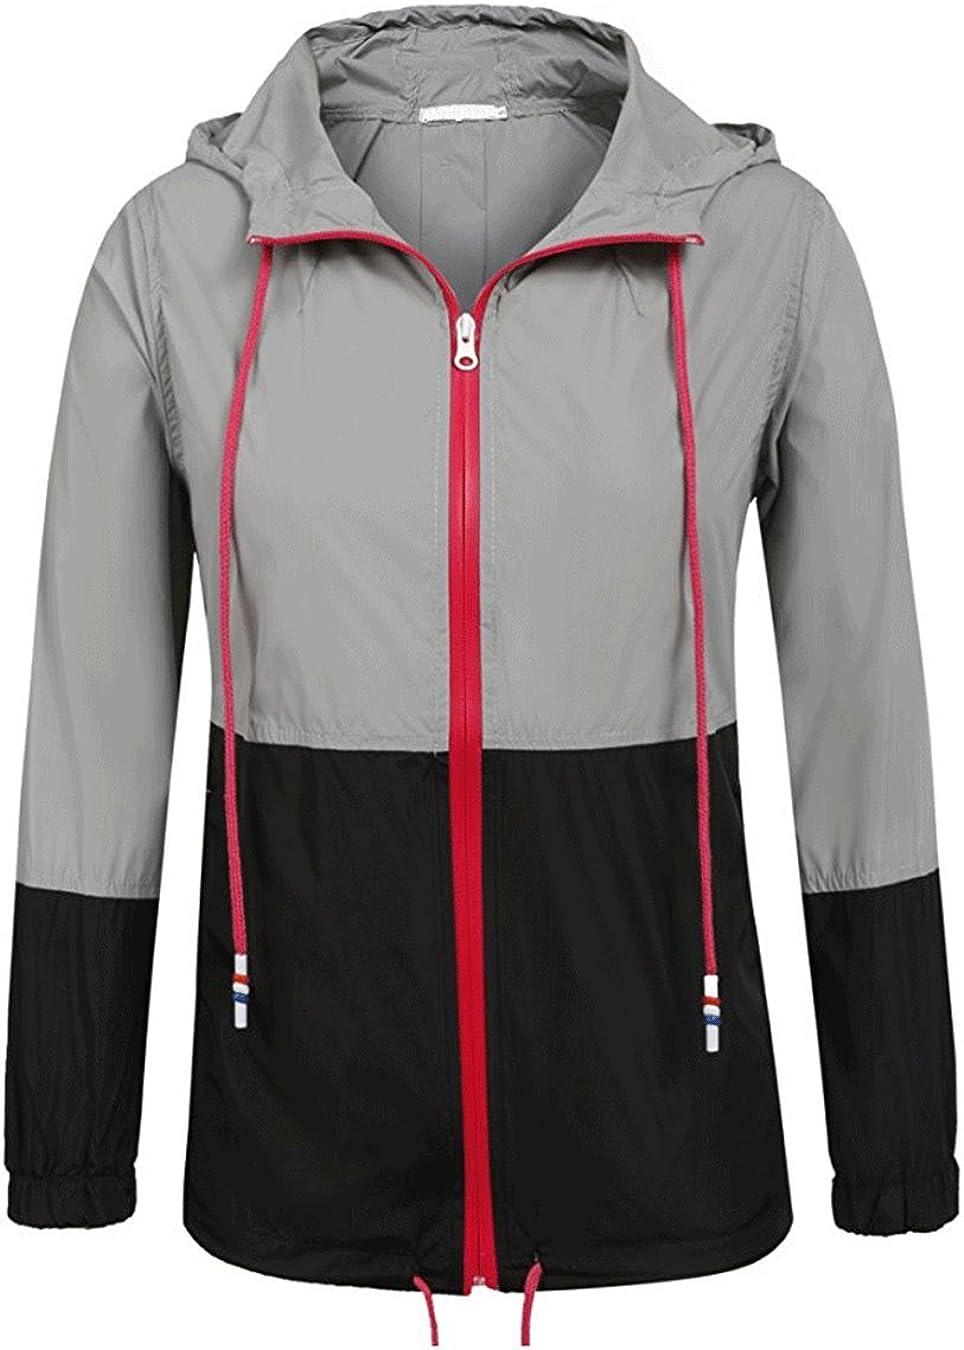 Hount Women Casual Lightweight Outdoor Waterproof Raincoat Hooded Rain Jacket XXL, Black